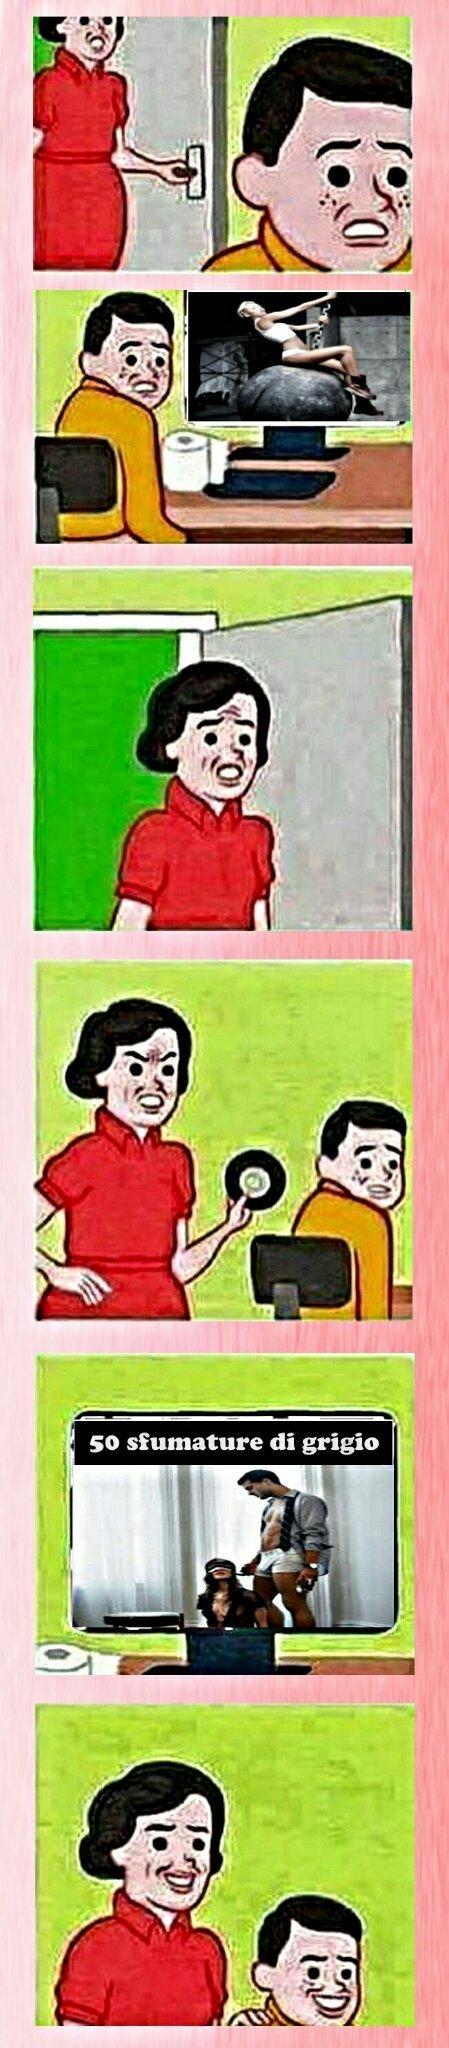 Bella idea mamma!! - meme